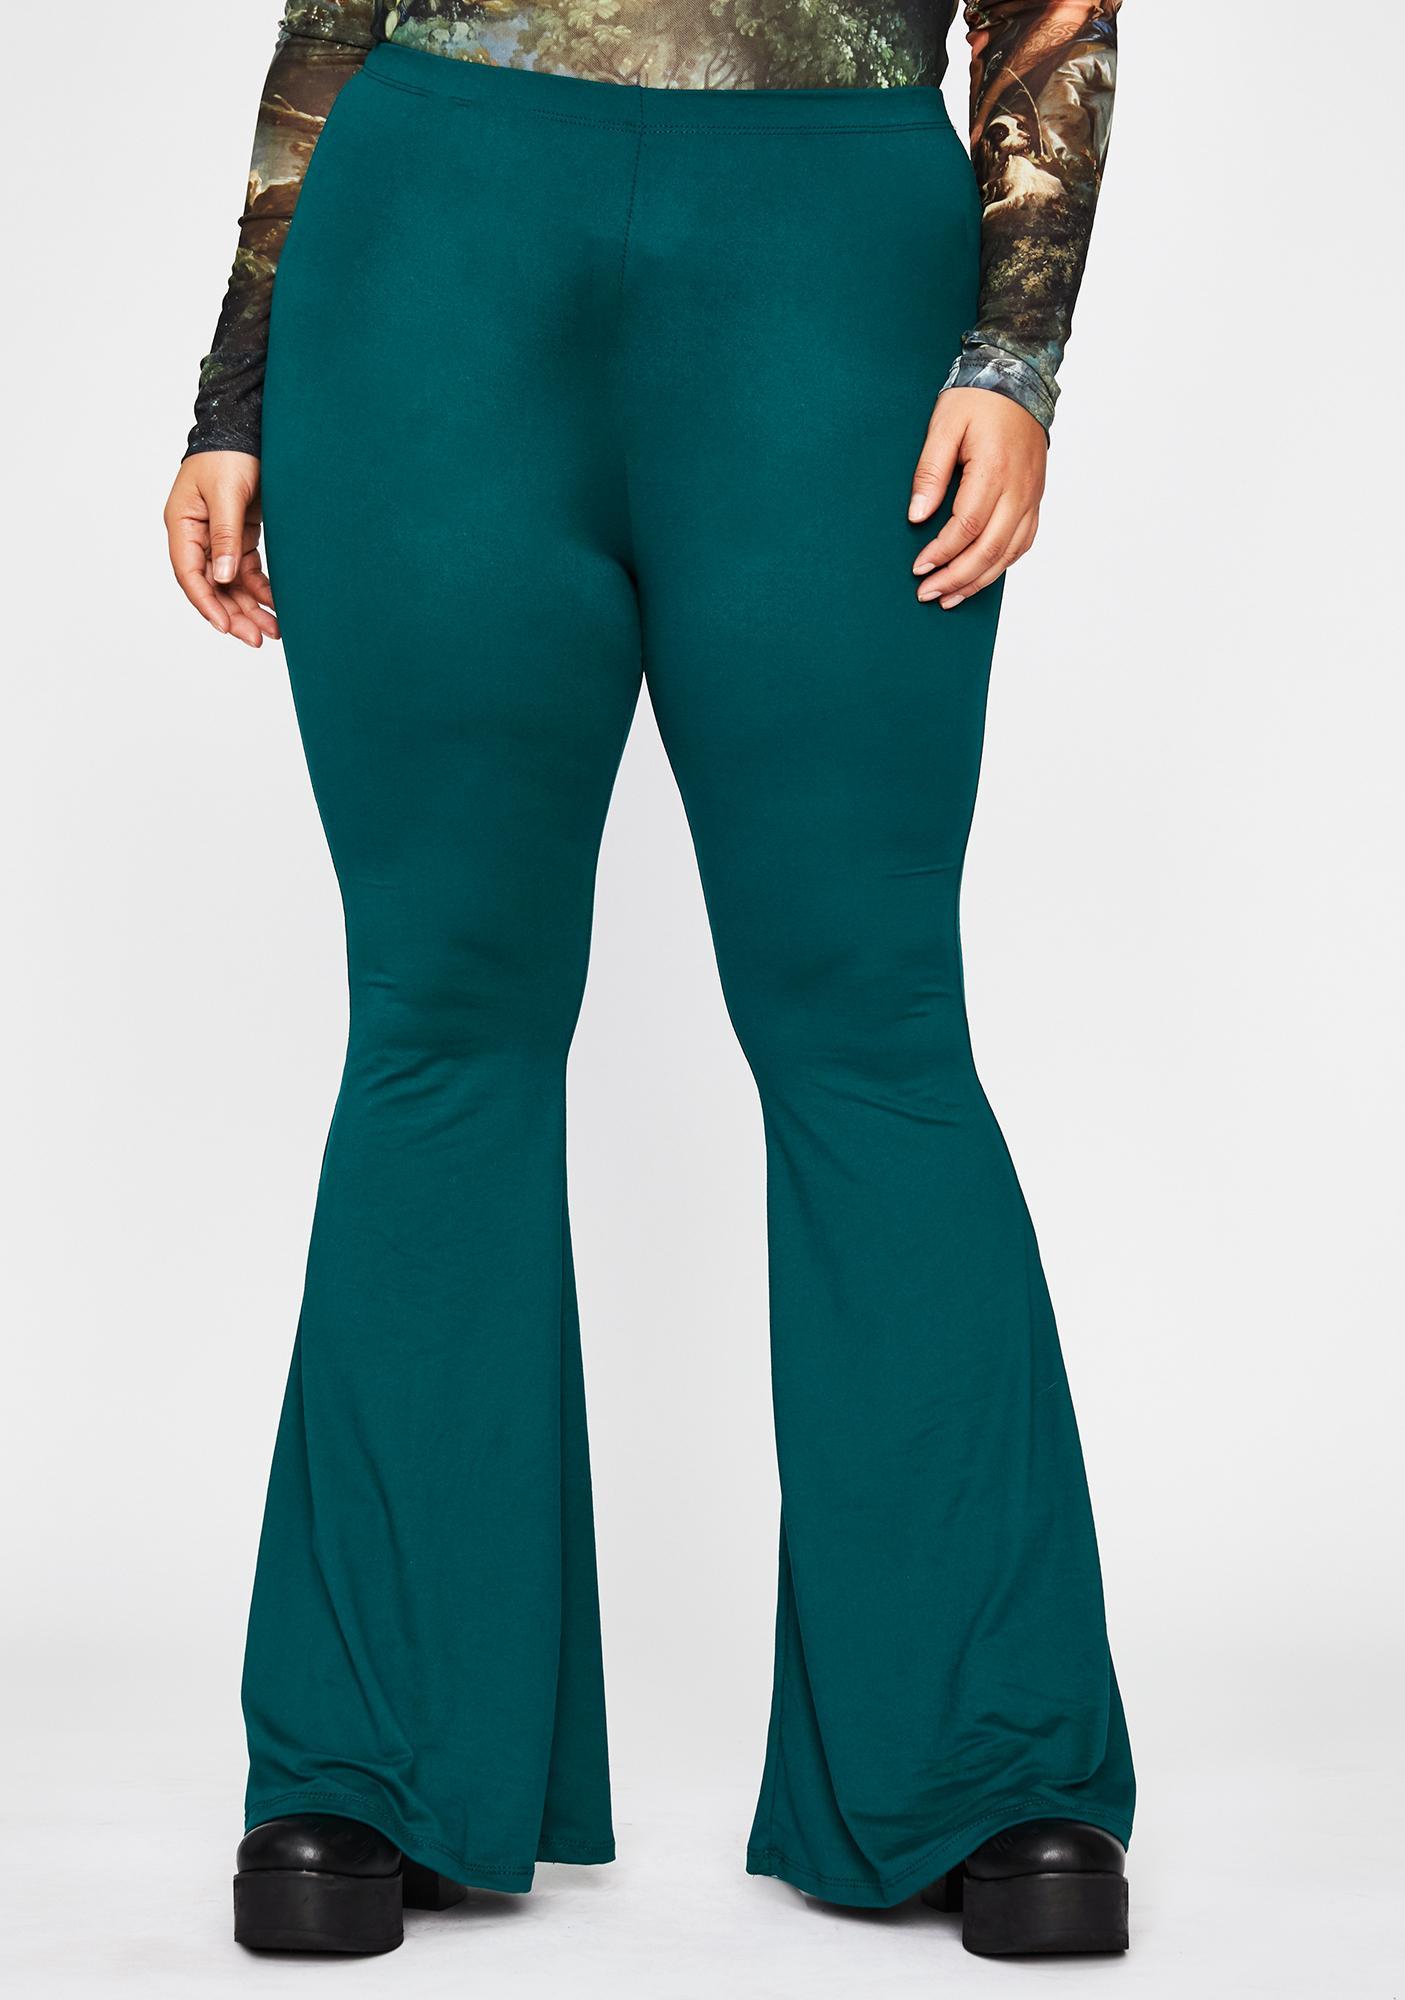 Jade Totally Radical Love Flare Pants